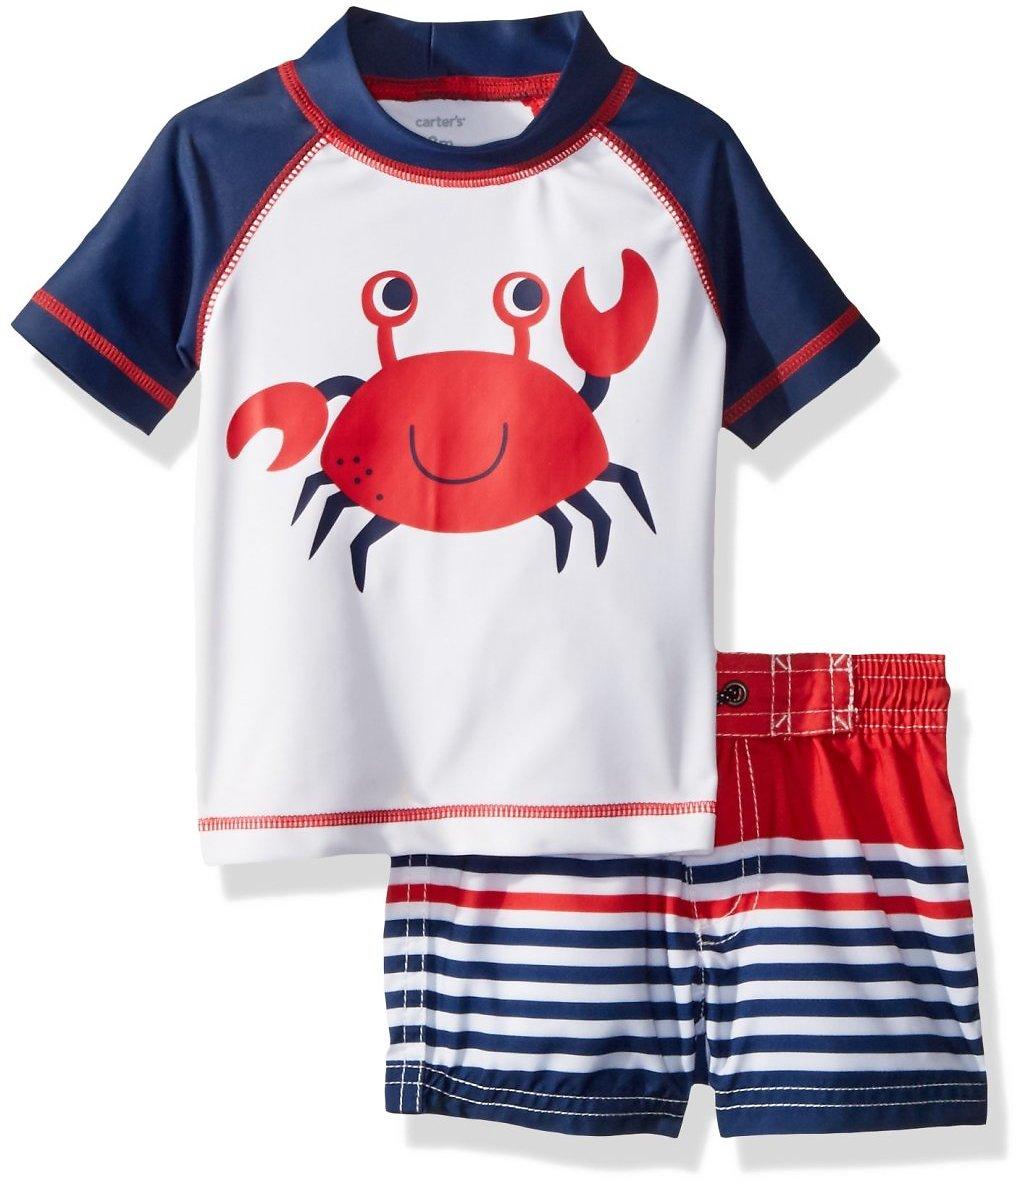 Carter's Baby Boys' Rashguard Set, Navy Crab $14.99 $15